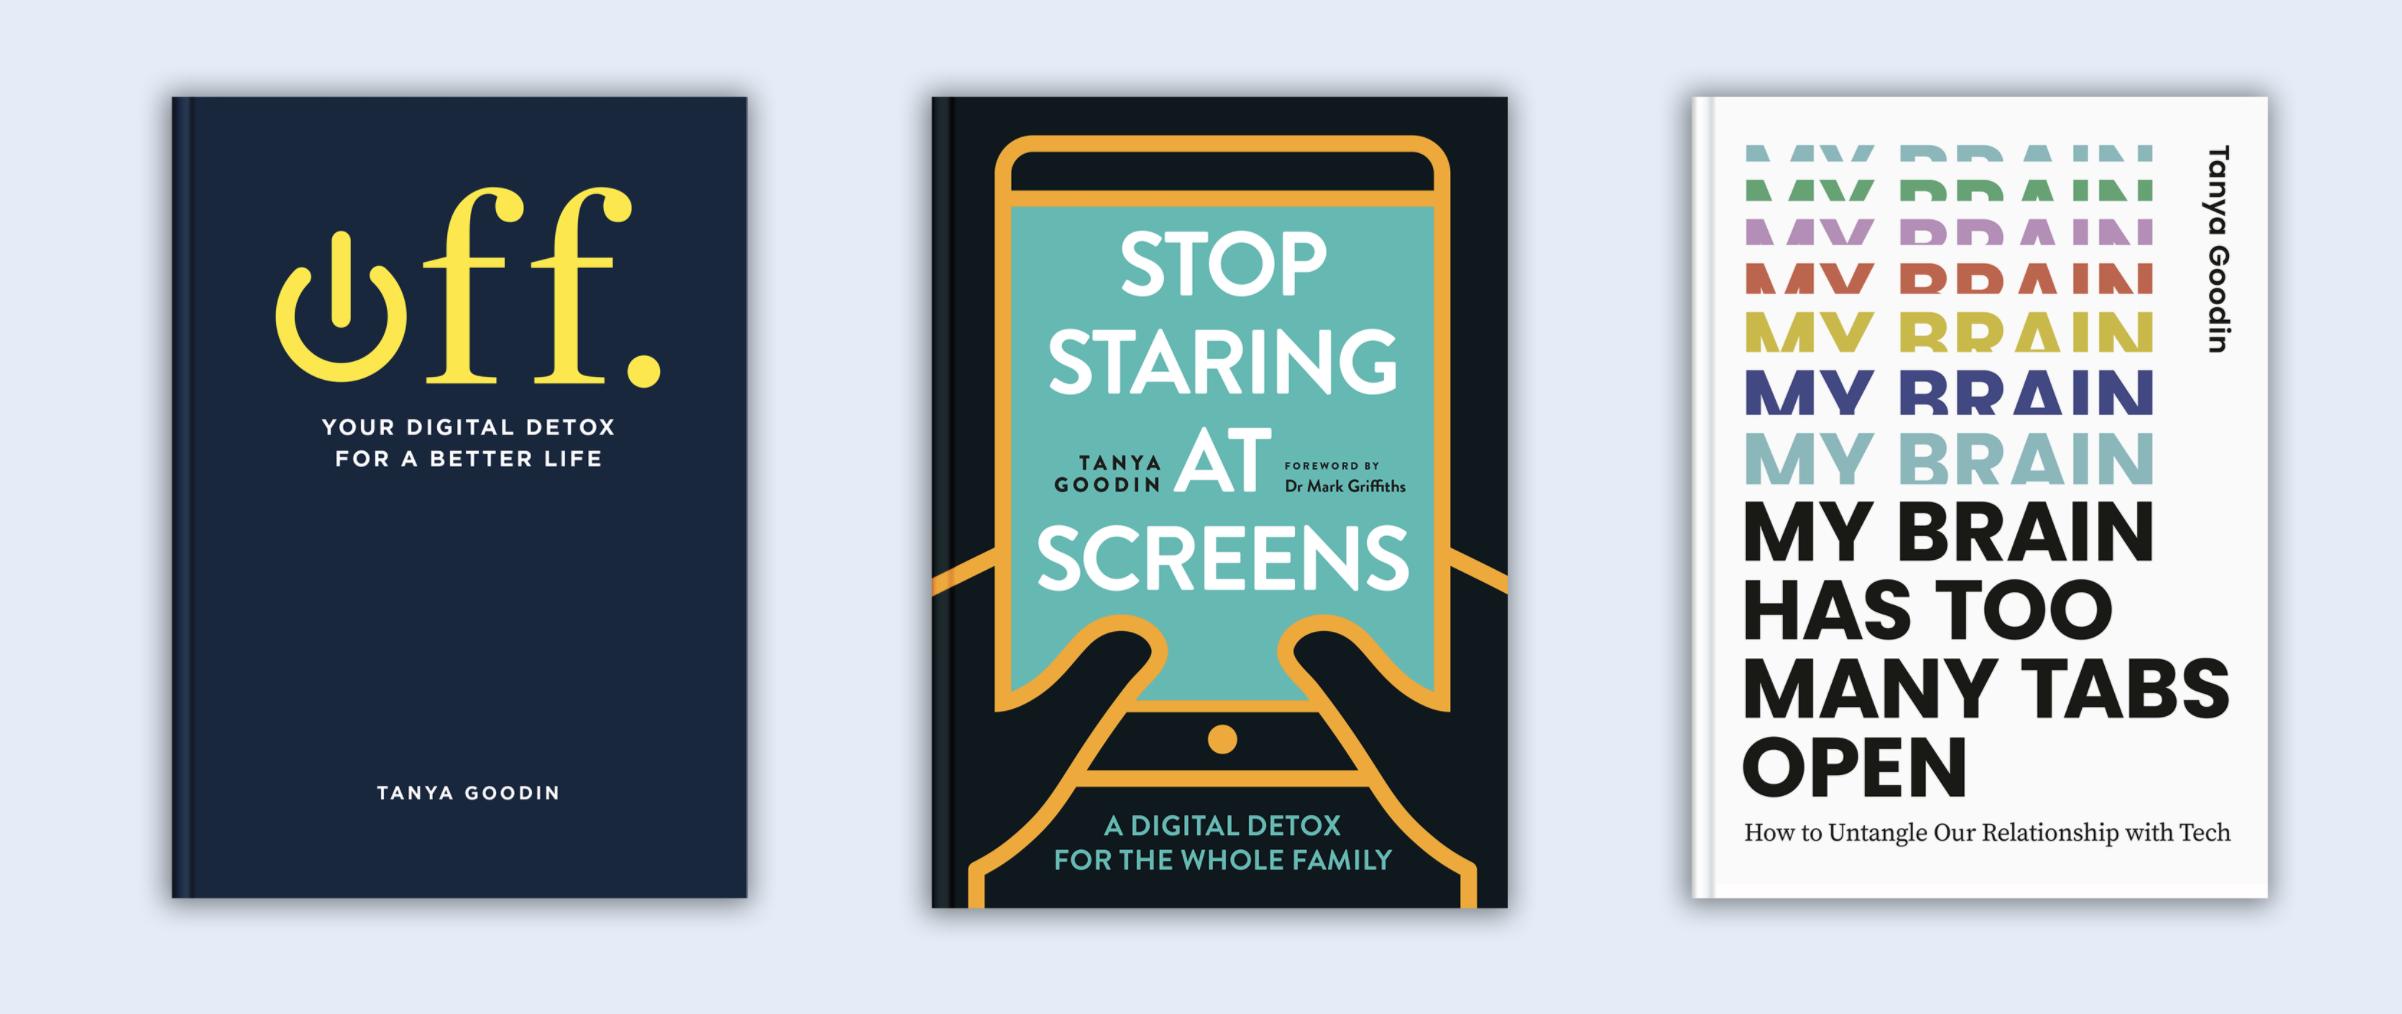 digital detox books by Tanya Goodin